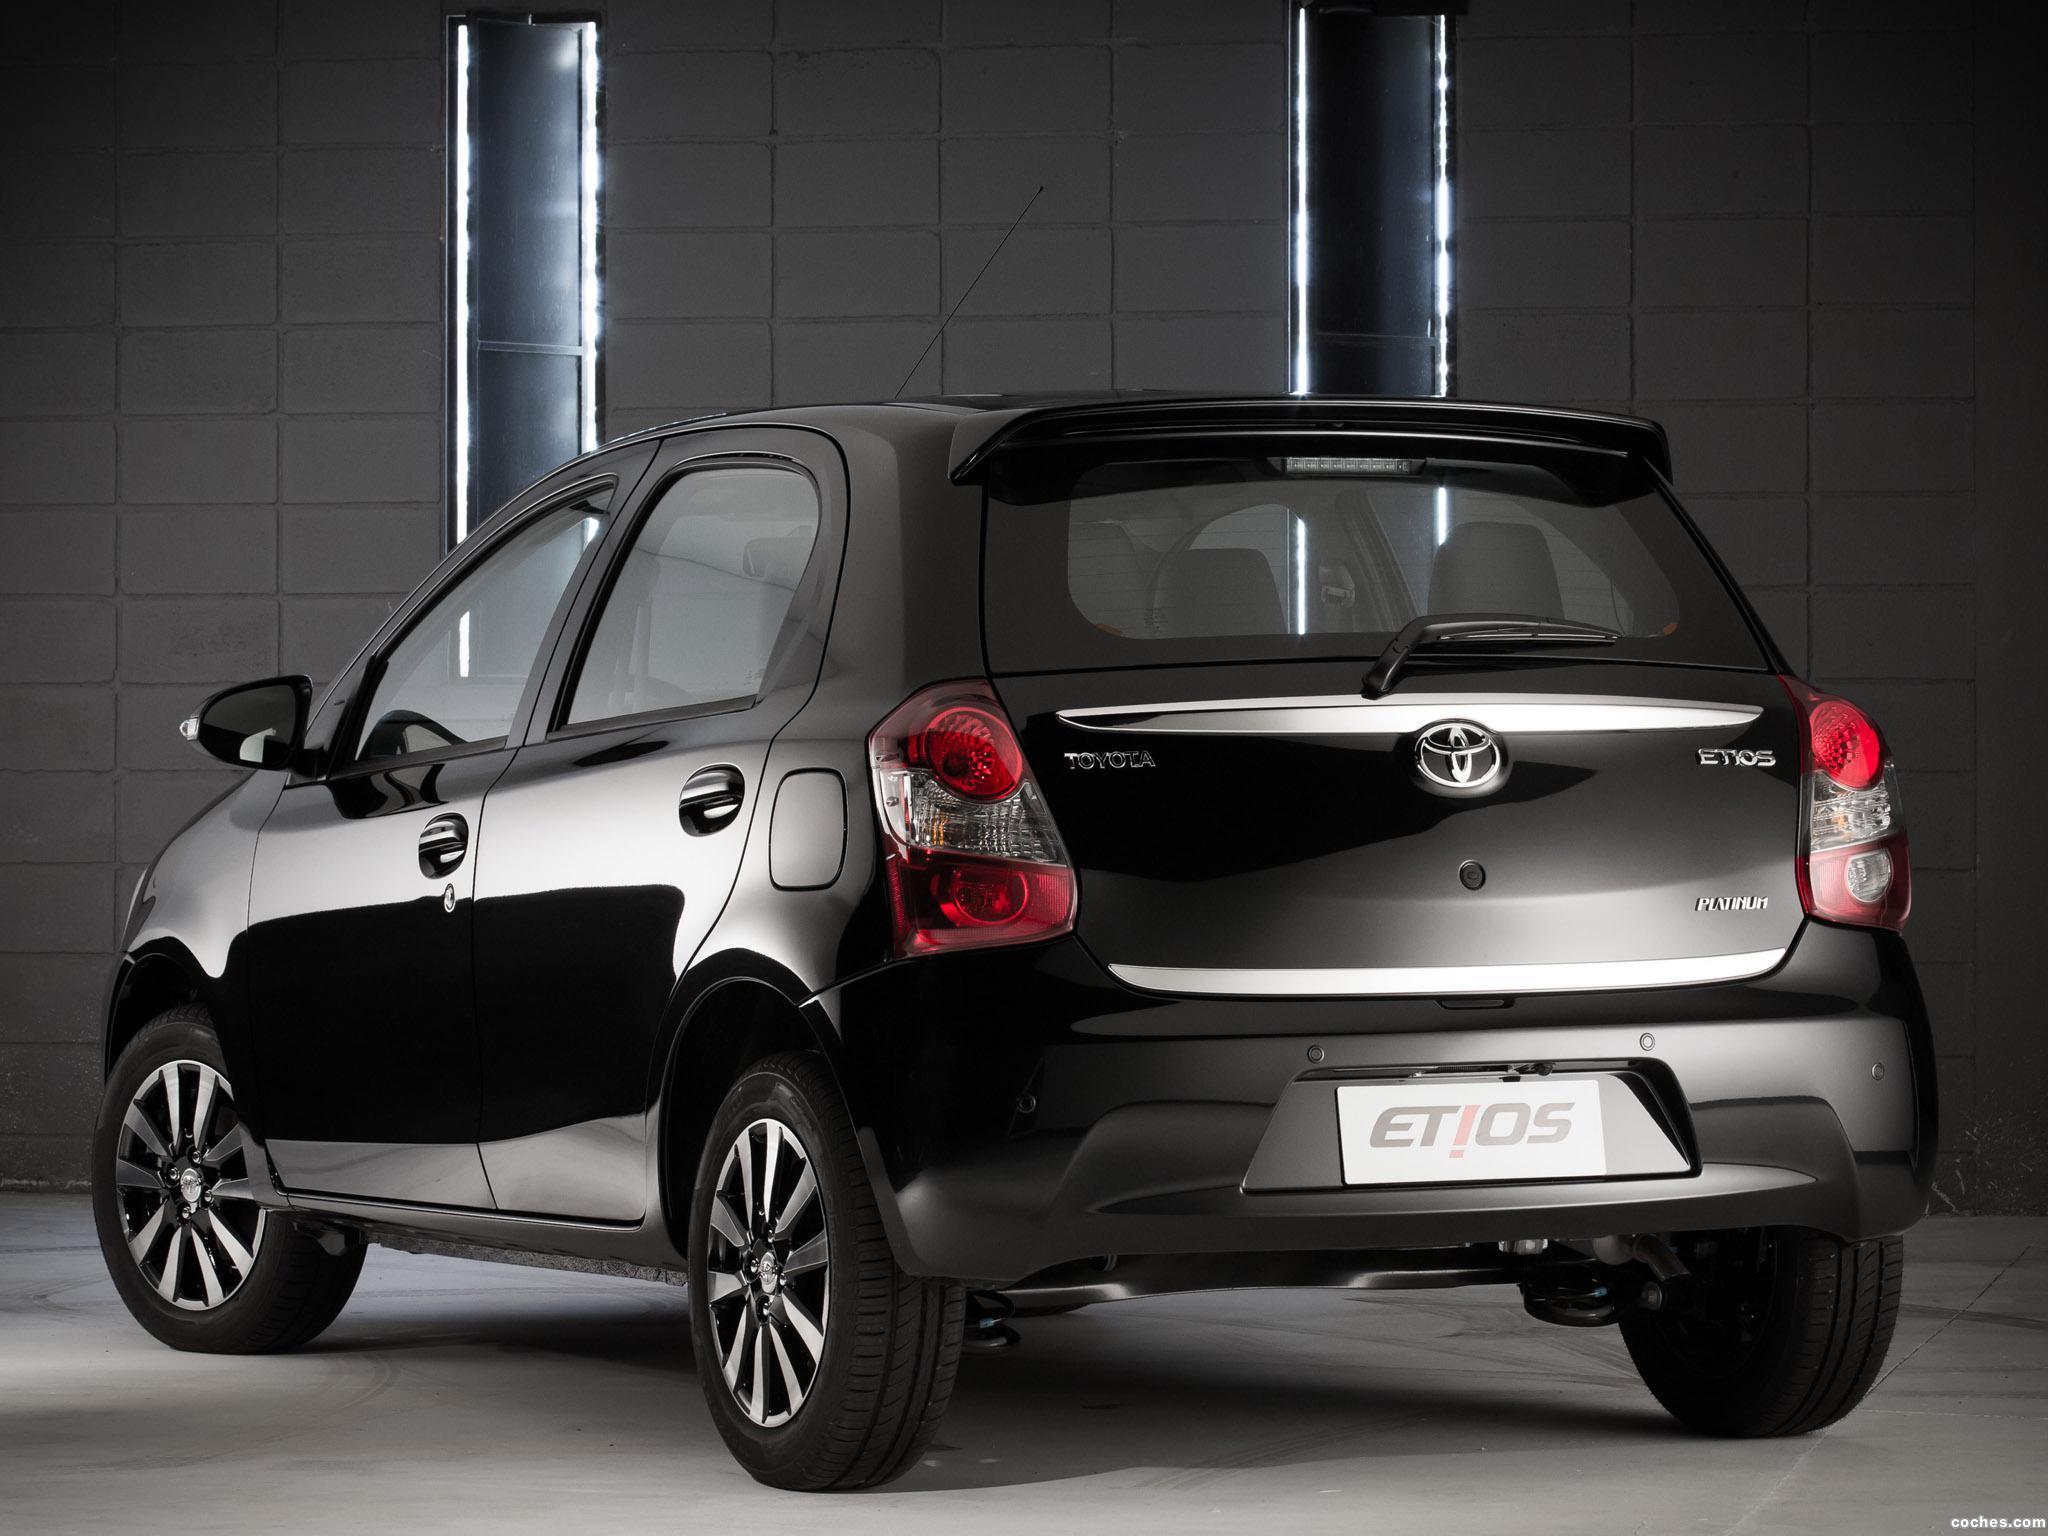 Foto 4 de Toyota Etios Platinum Hatchback 2014